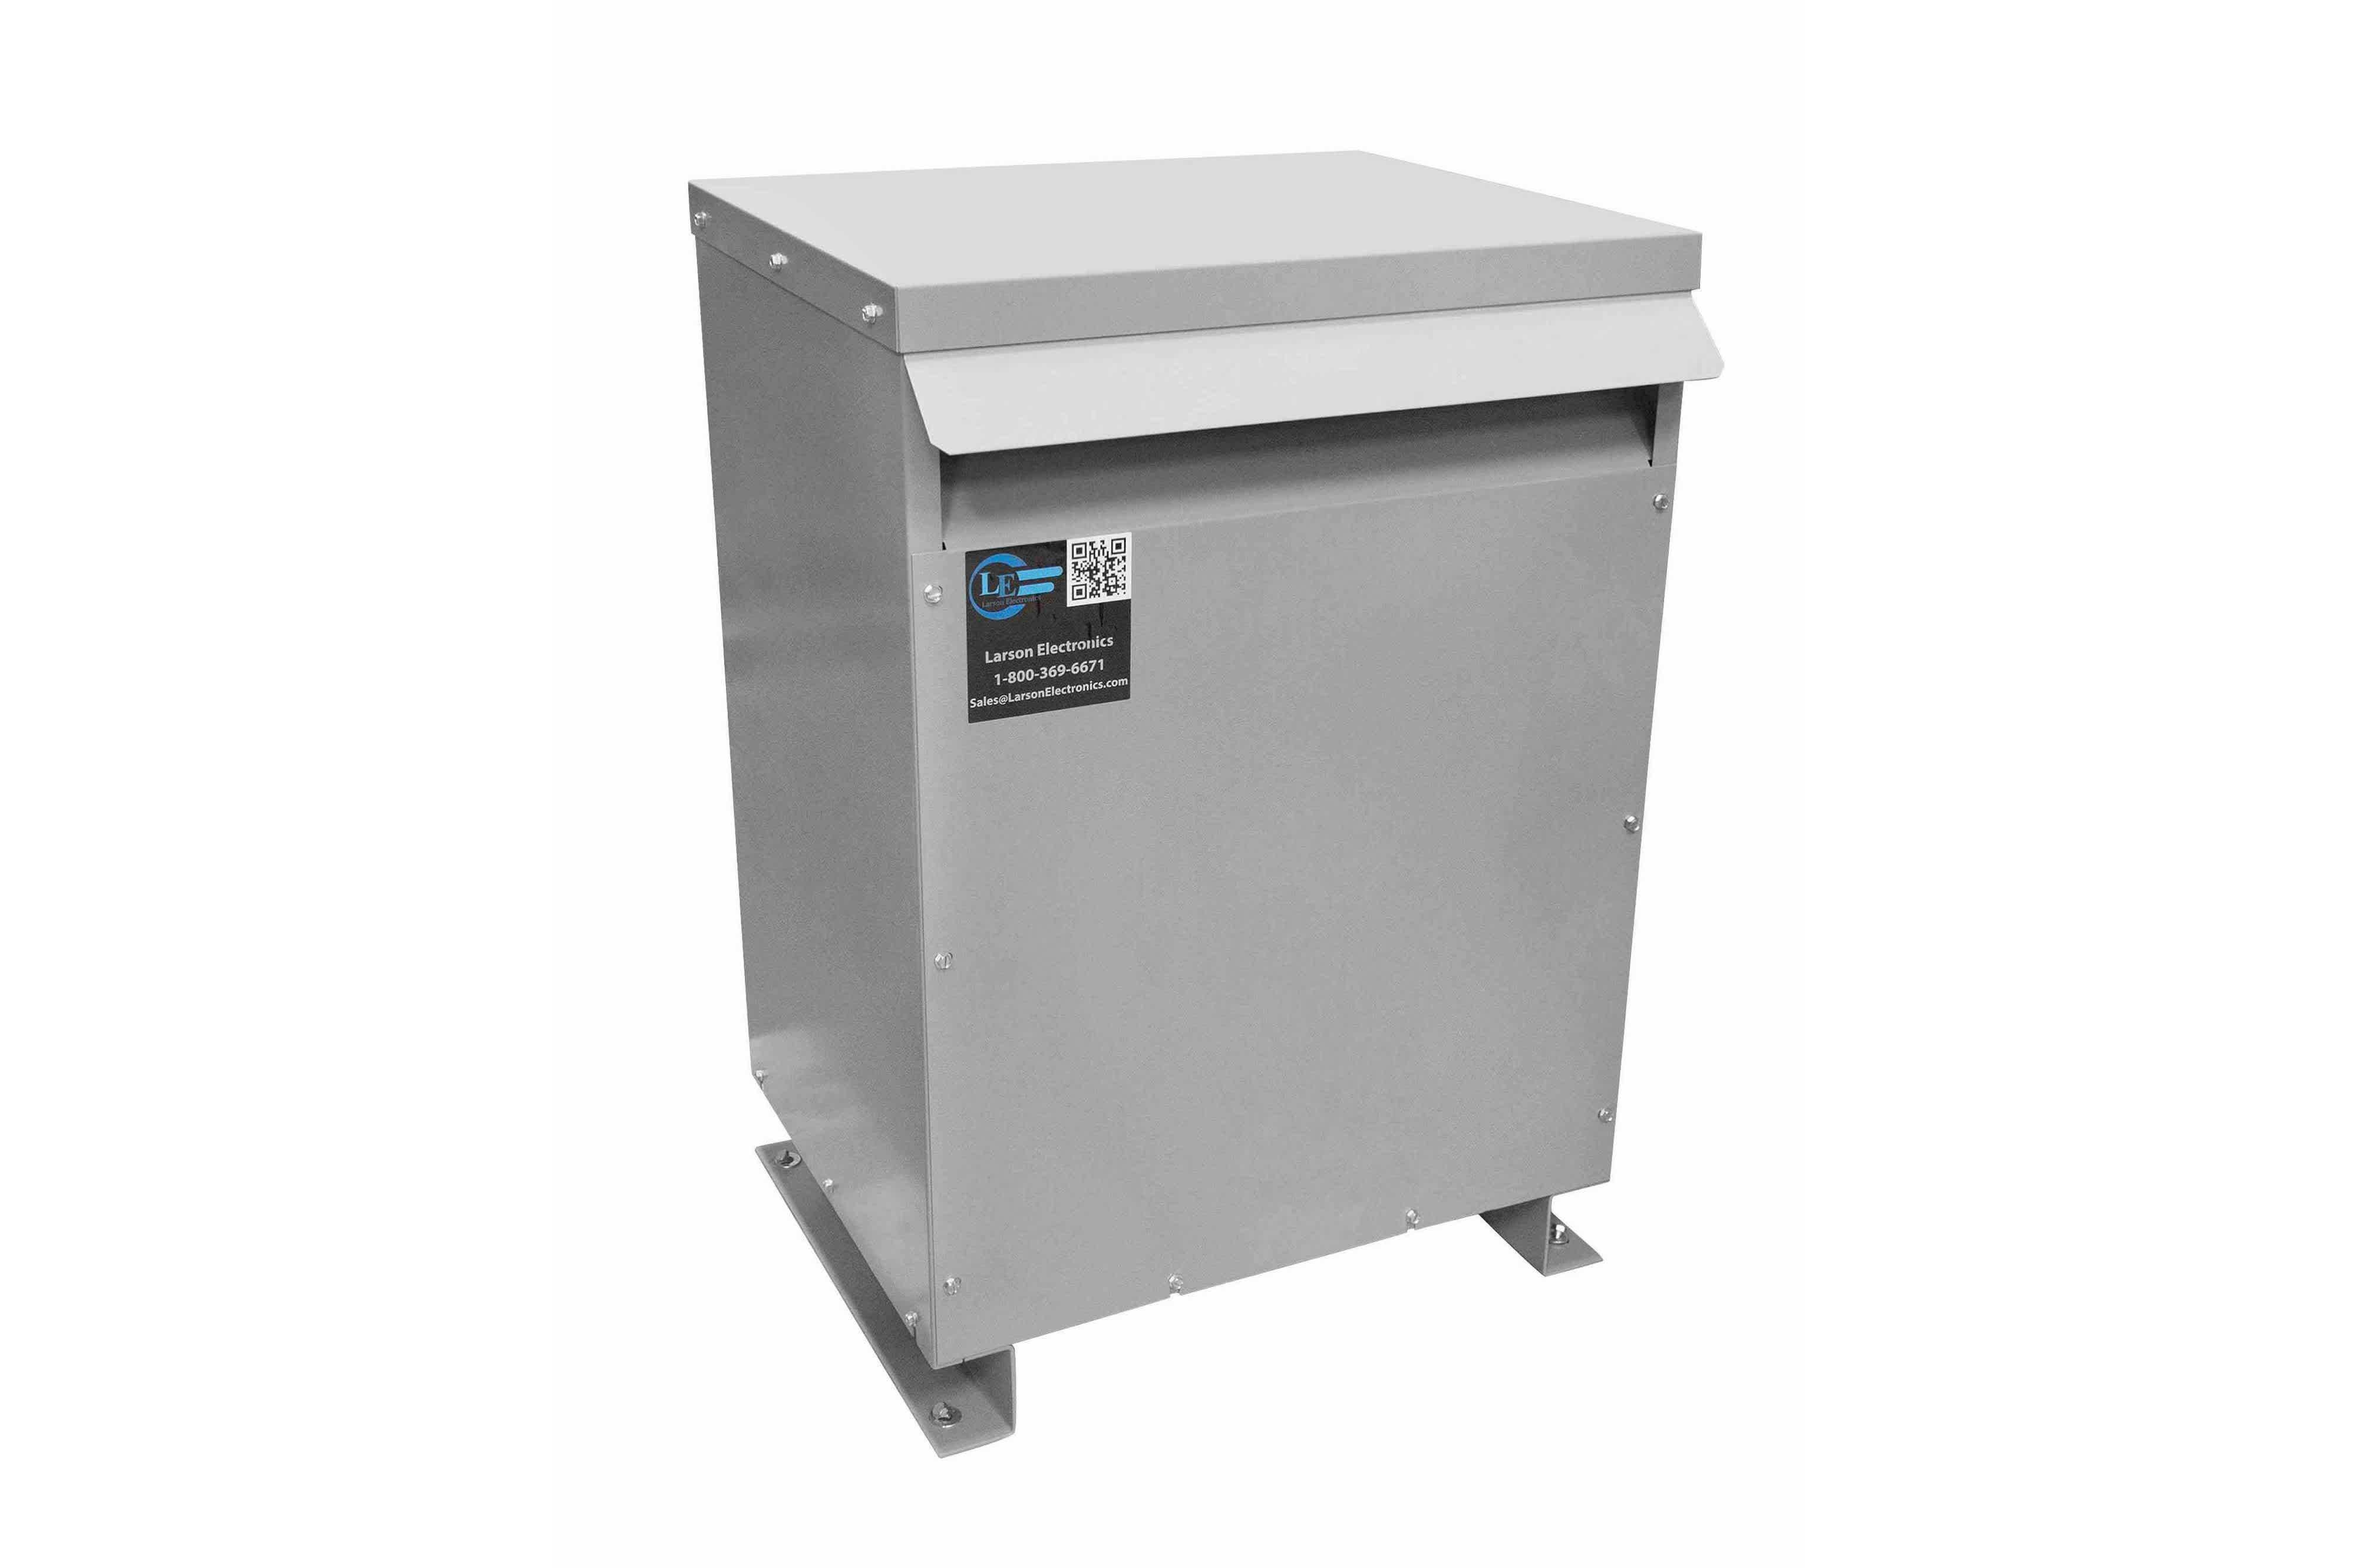 225 kVA 3PH Isolation Transformer, 400V Wye Primary, 240V Delta Secondary, N3R, Ventilated, 60 Hz